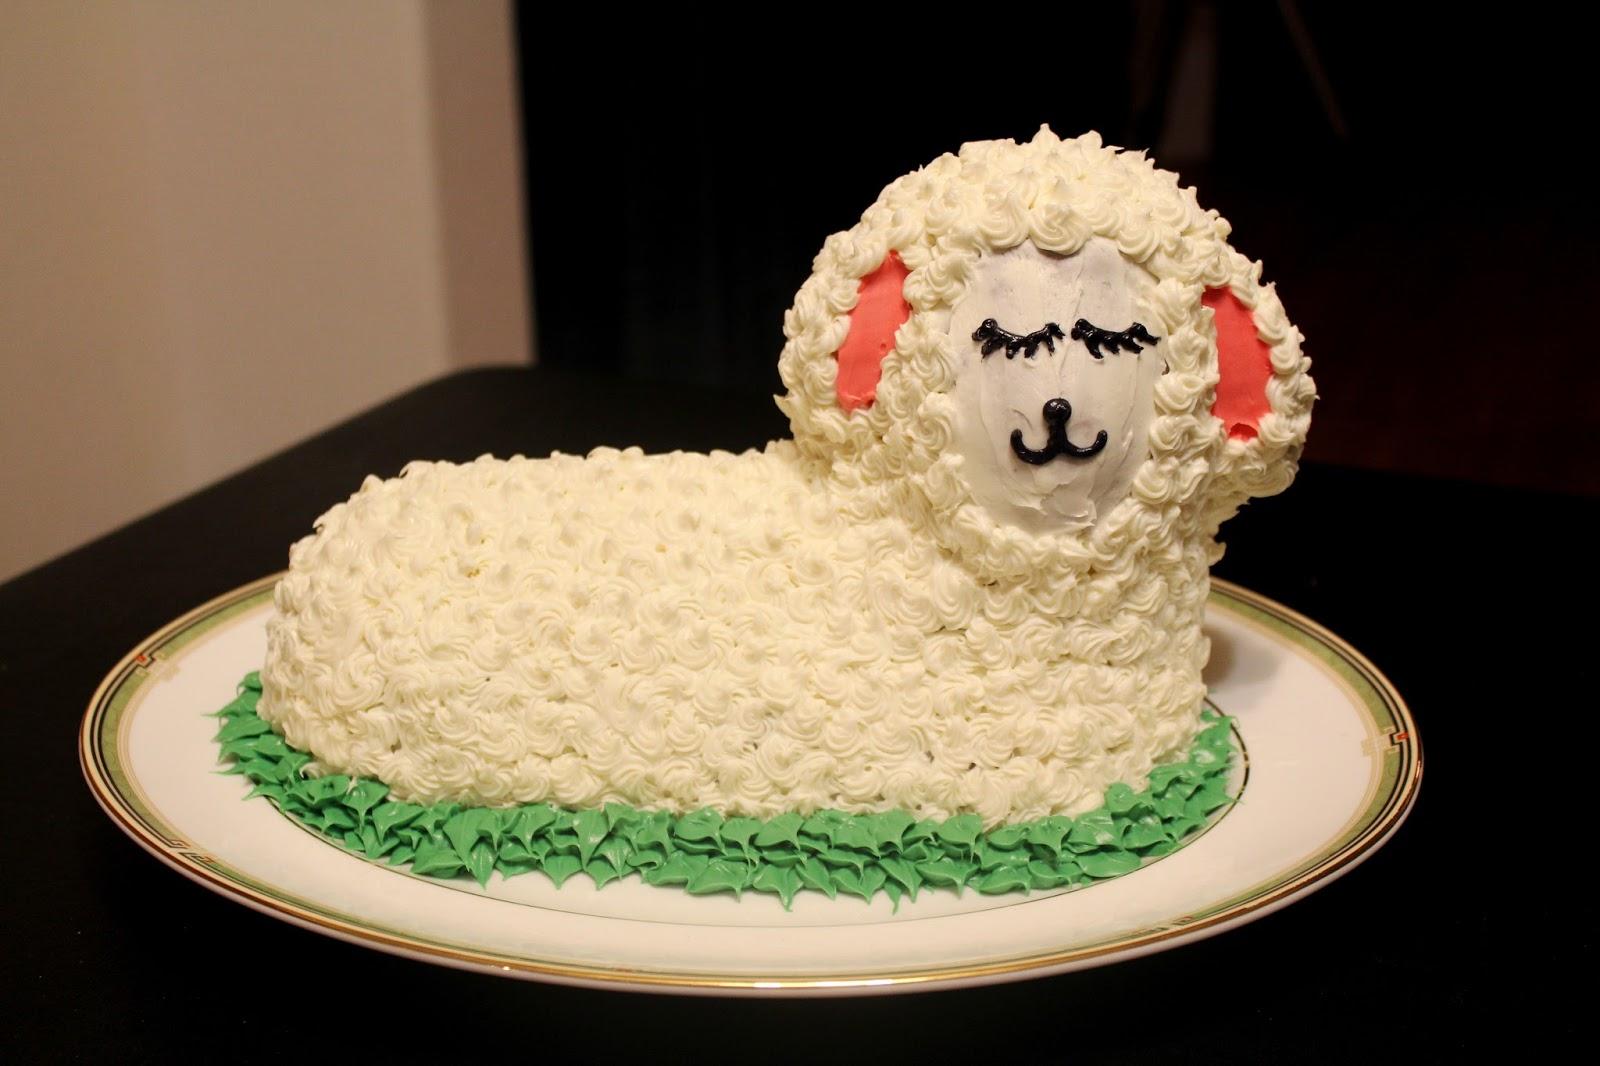 Pretty Handsome: Baa, Baa Lamb Cake